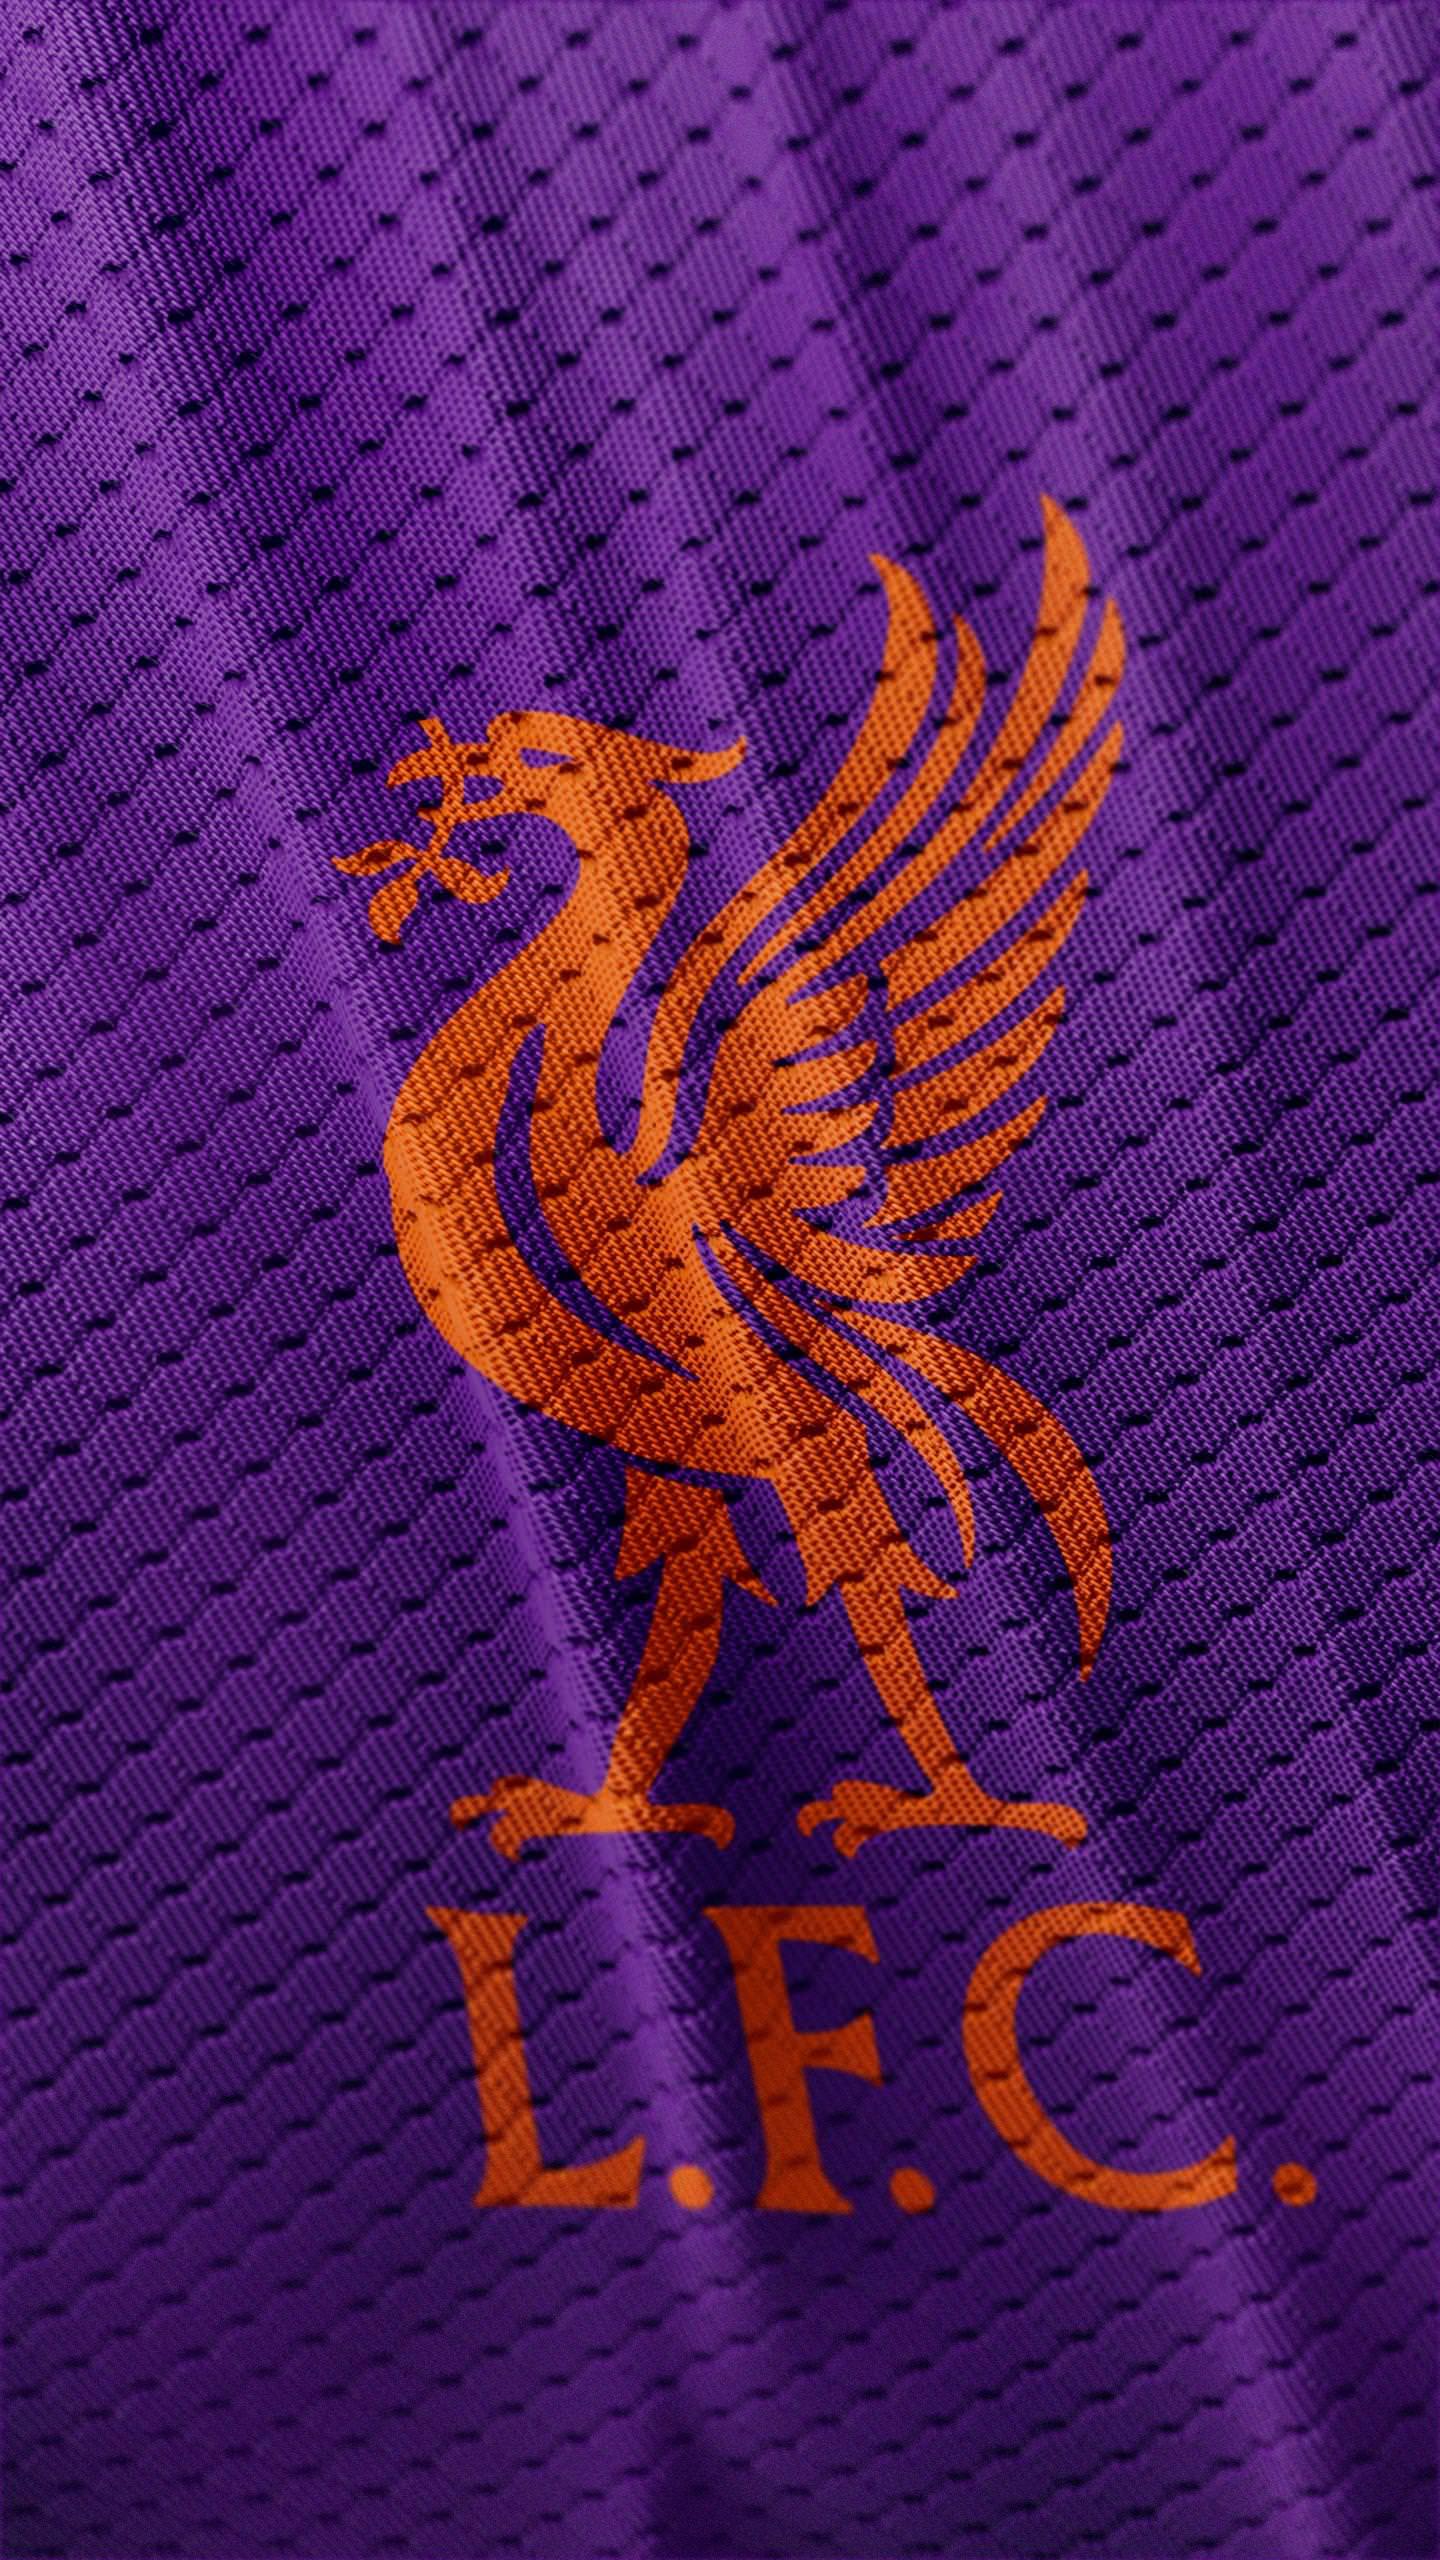 Liverpool Wallpaper Iphone Xs Max